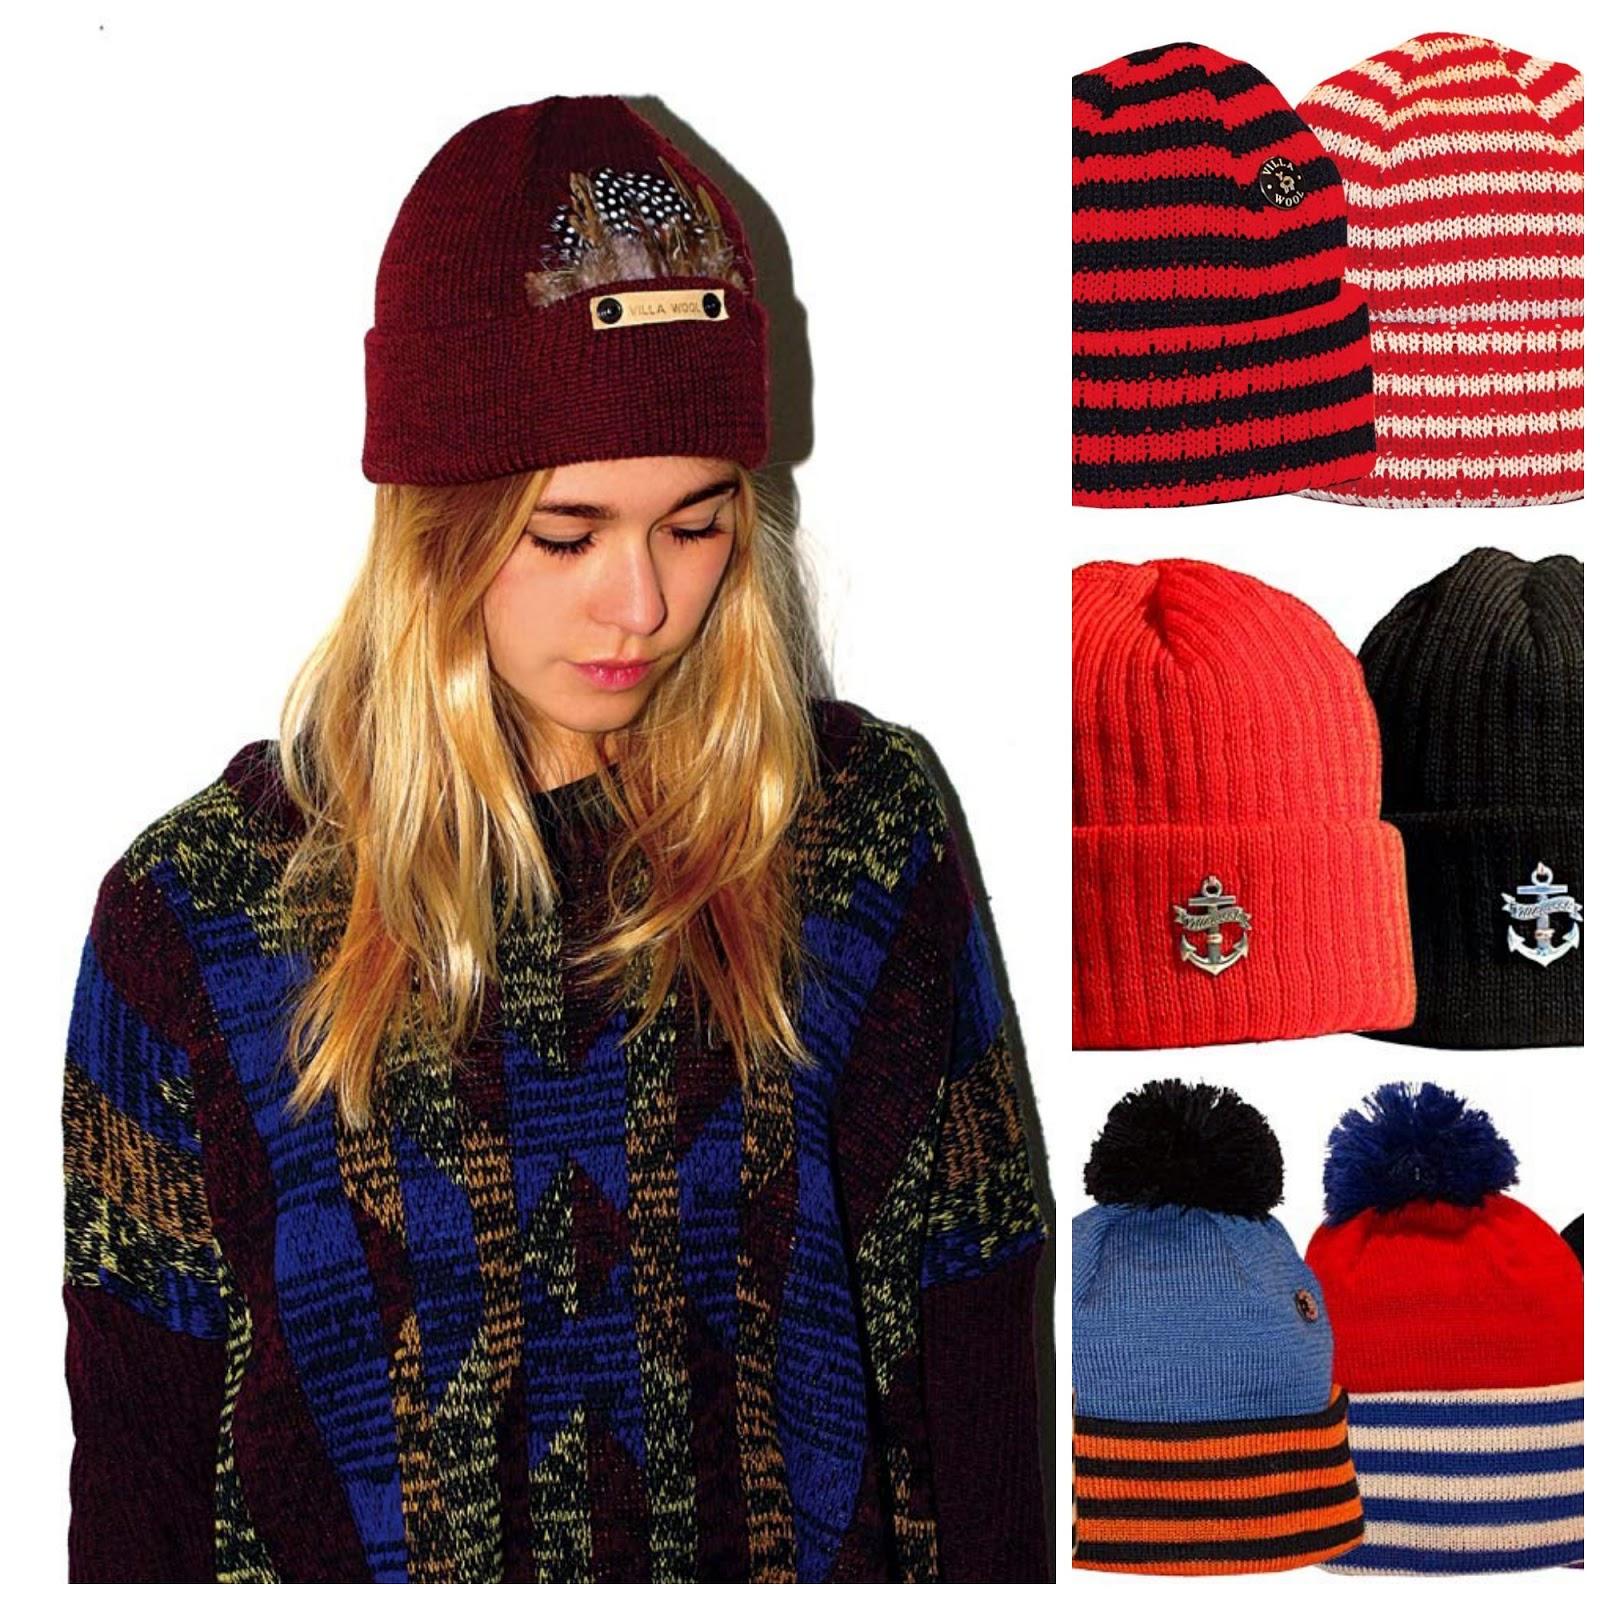 villawool, finnsig design, merinoull, merinowool, cap, beanie, pipo, mössa, winterwear, kids, women, men